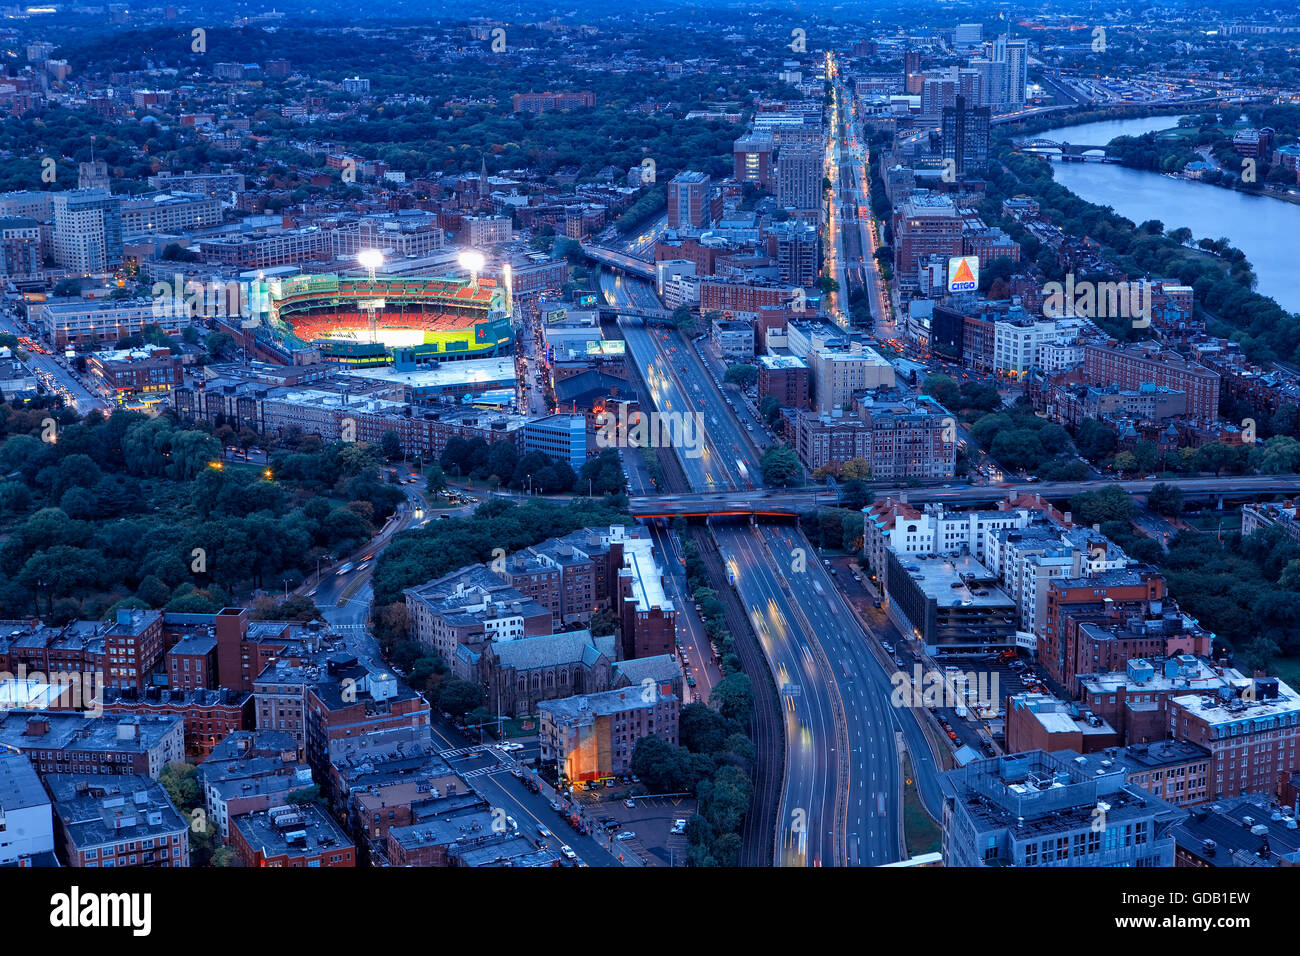 Boston y Base-ball stadium por la noche Imagen De Stock